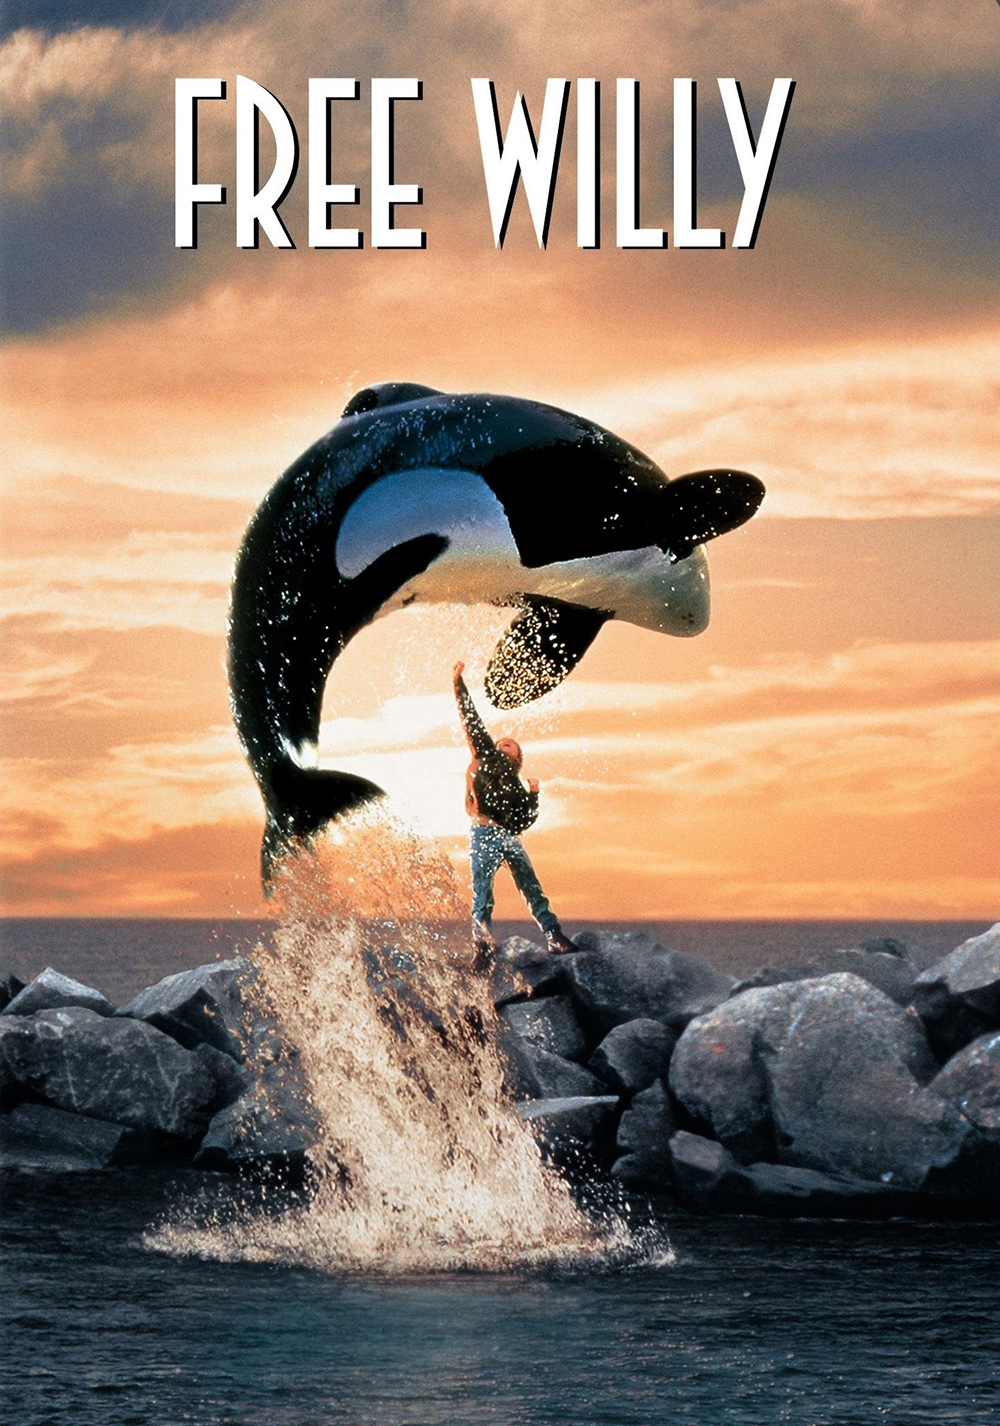 free willy movie fanart fanarttv